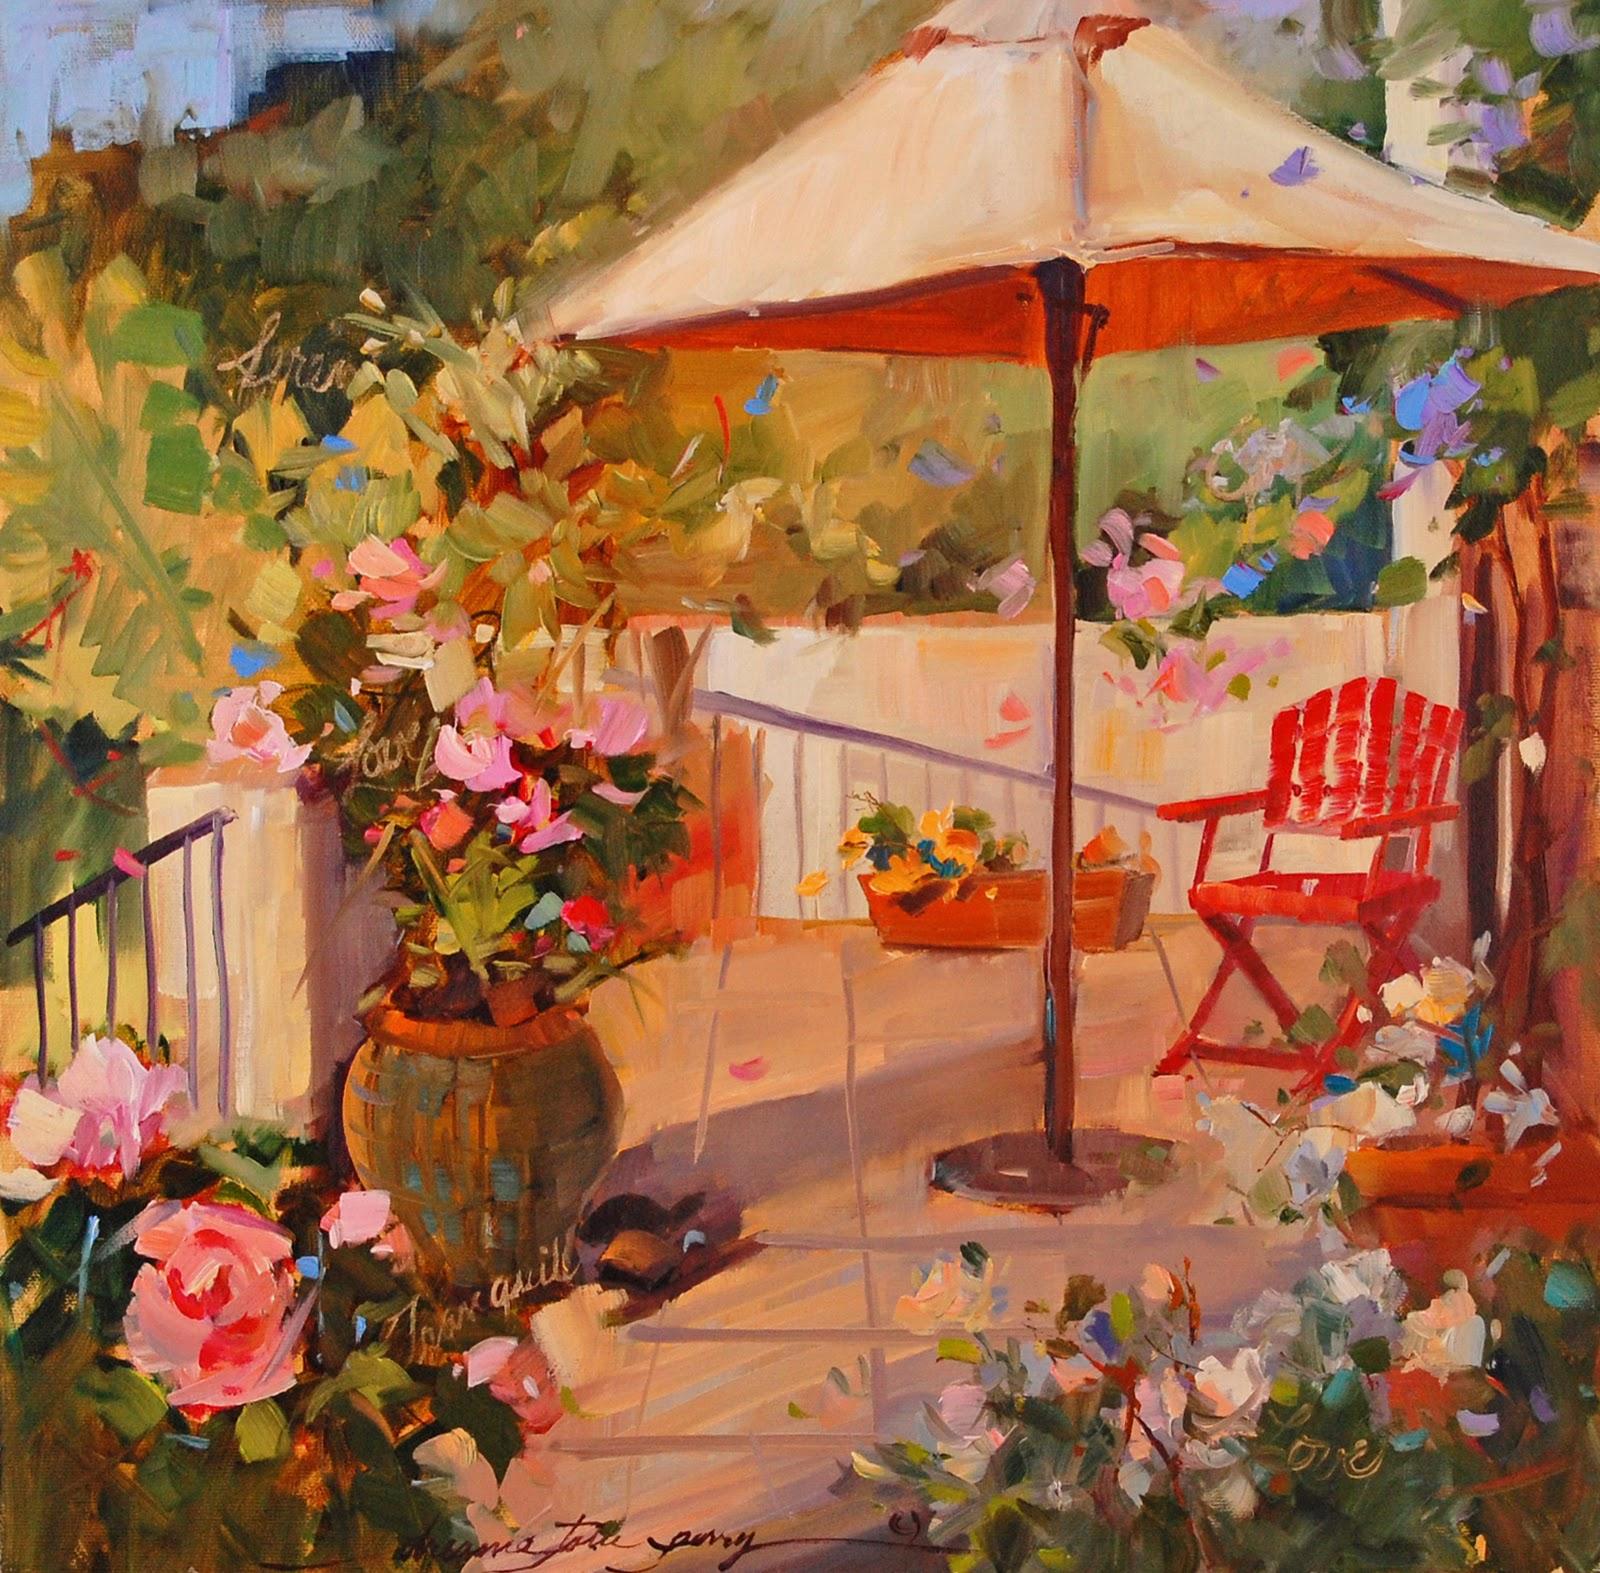 """A Little Bit of Paris in France?"" original fine art by Dreama Tolle Perry"